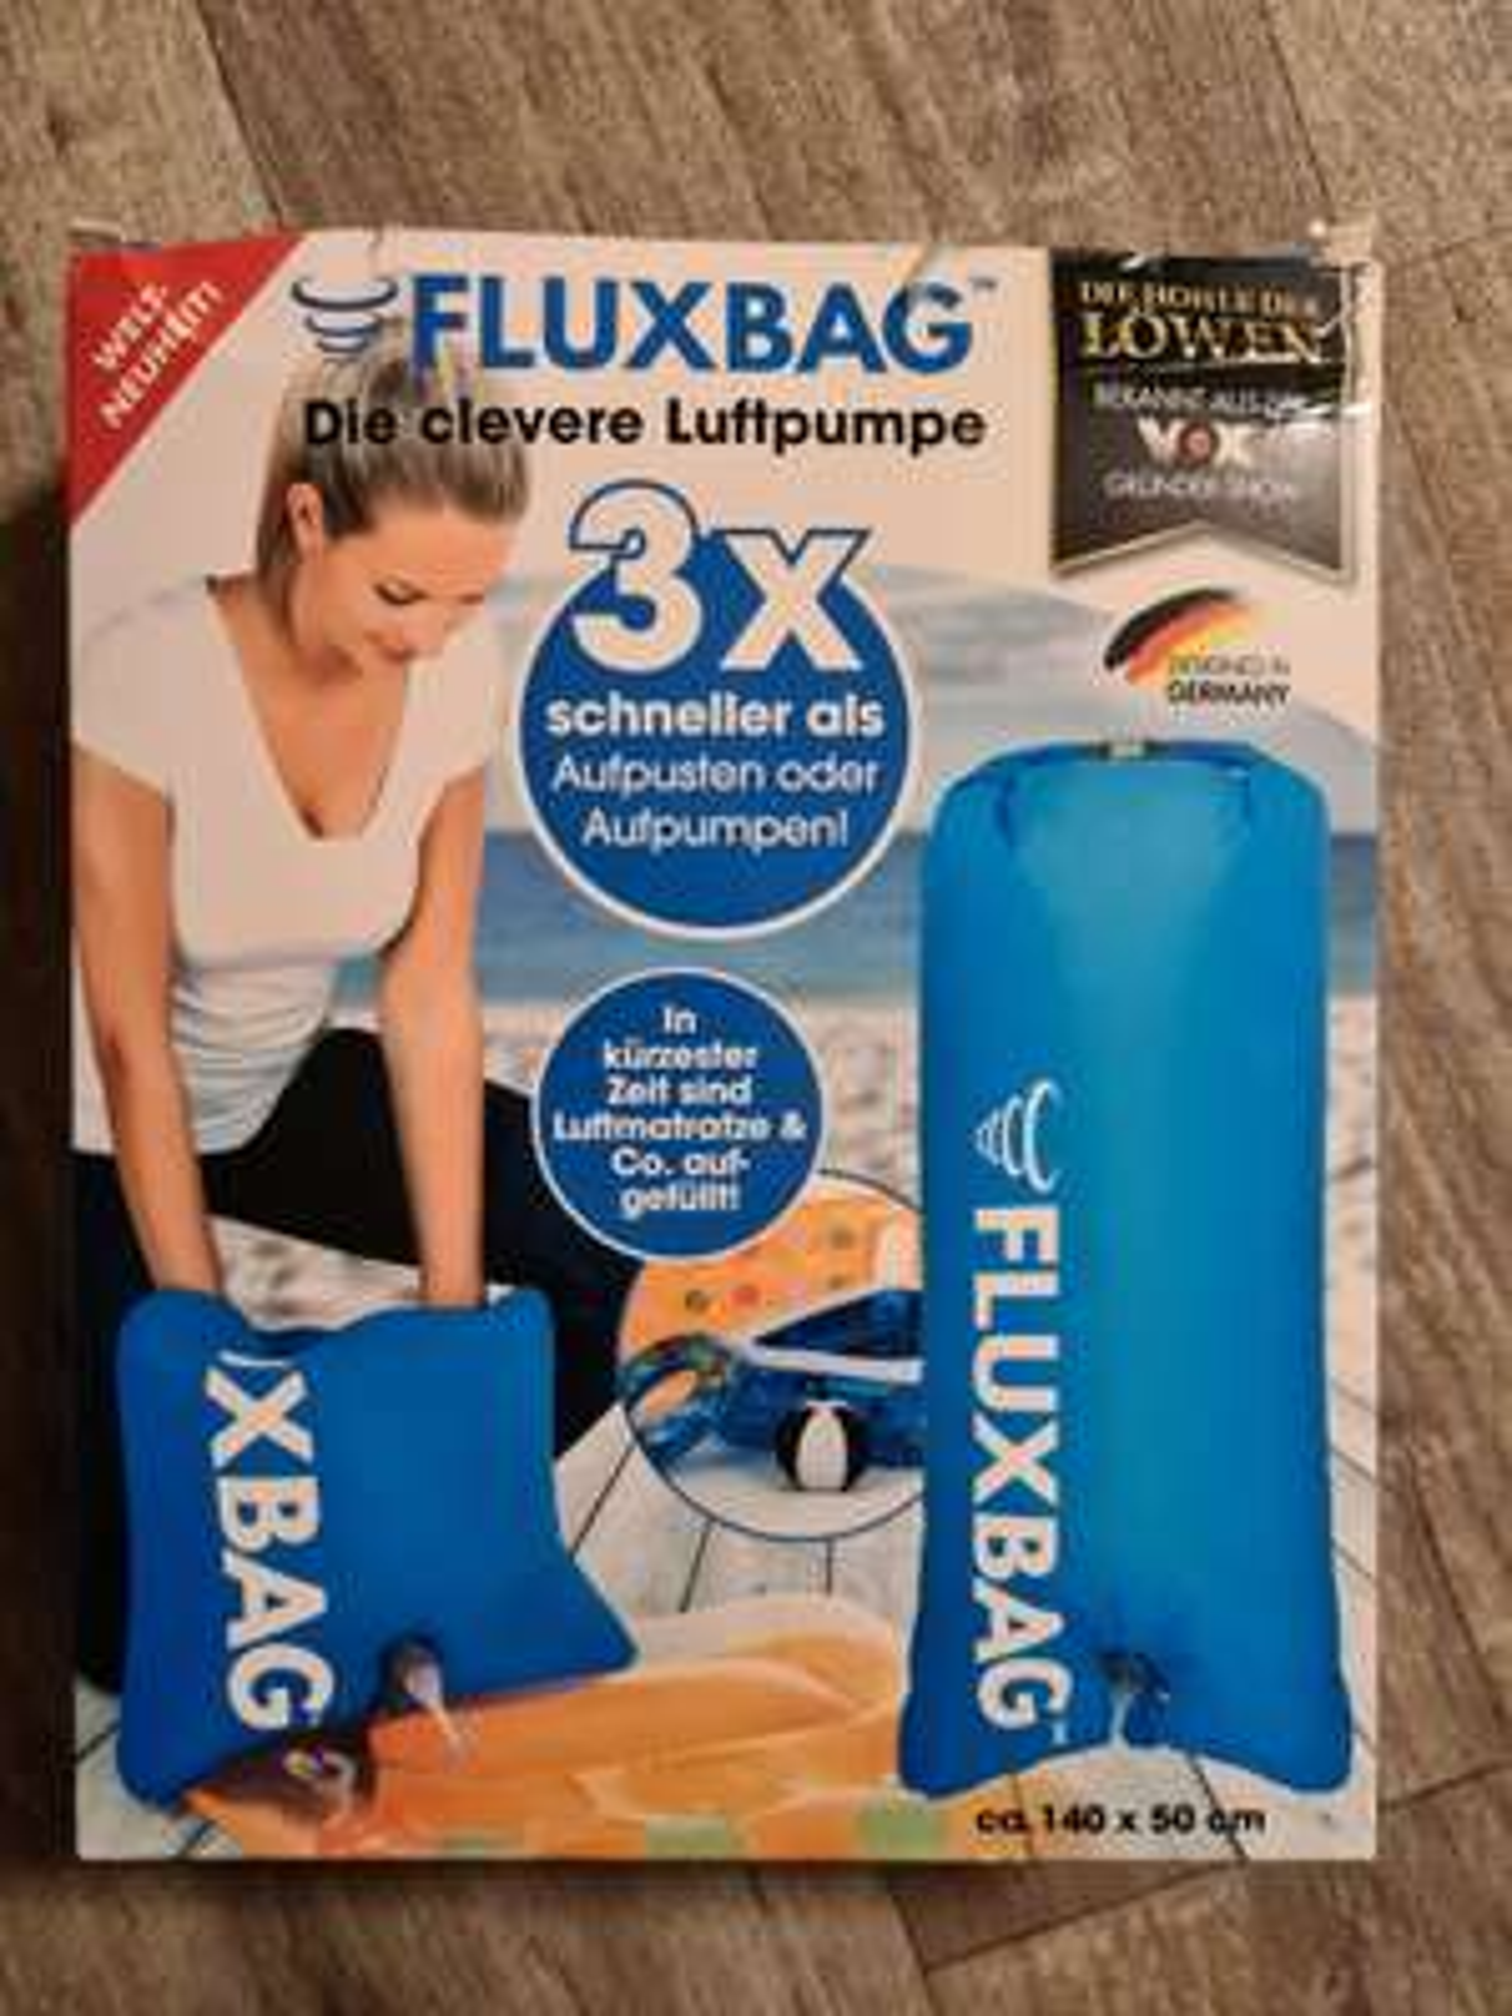 LOKAL Real Neukölln Fluxbag Luftpumpe